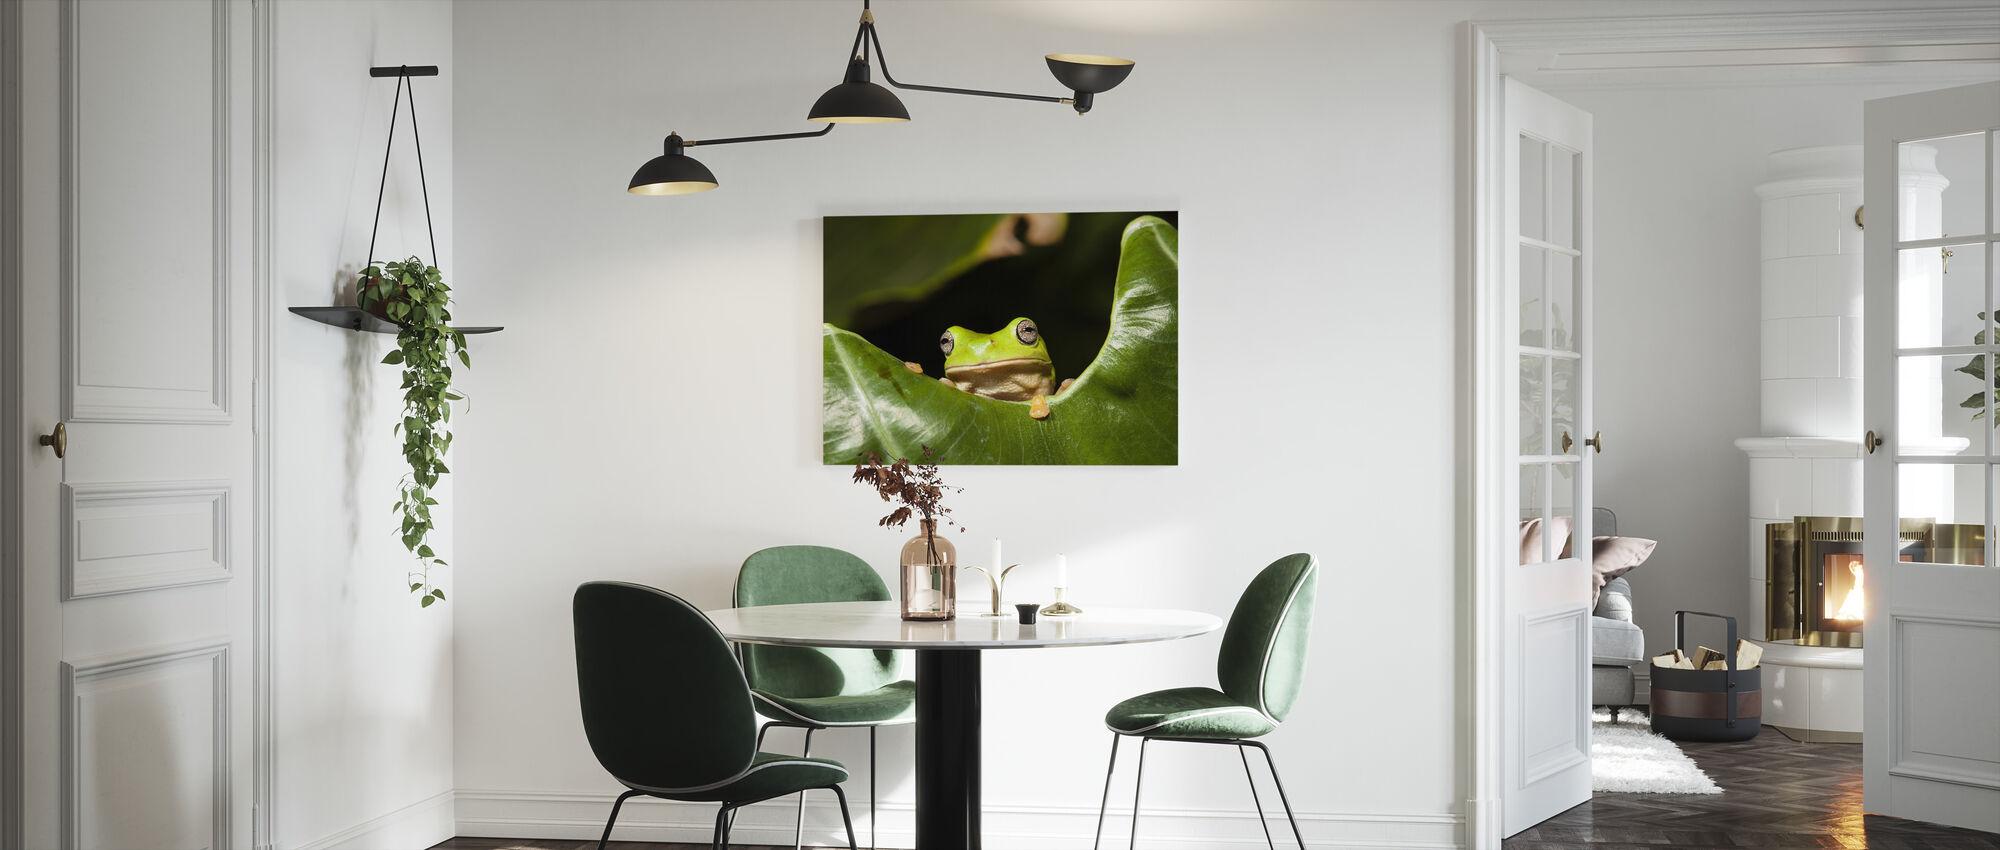 Green Tree Frog - Canvas print - Kitchen